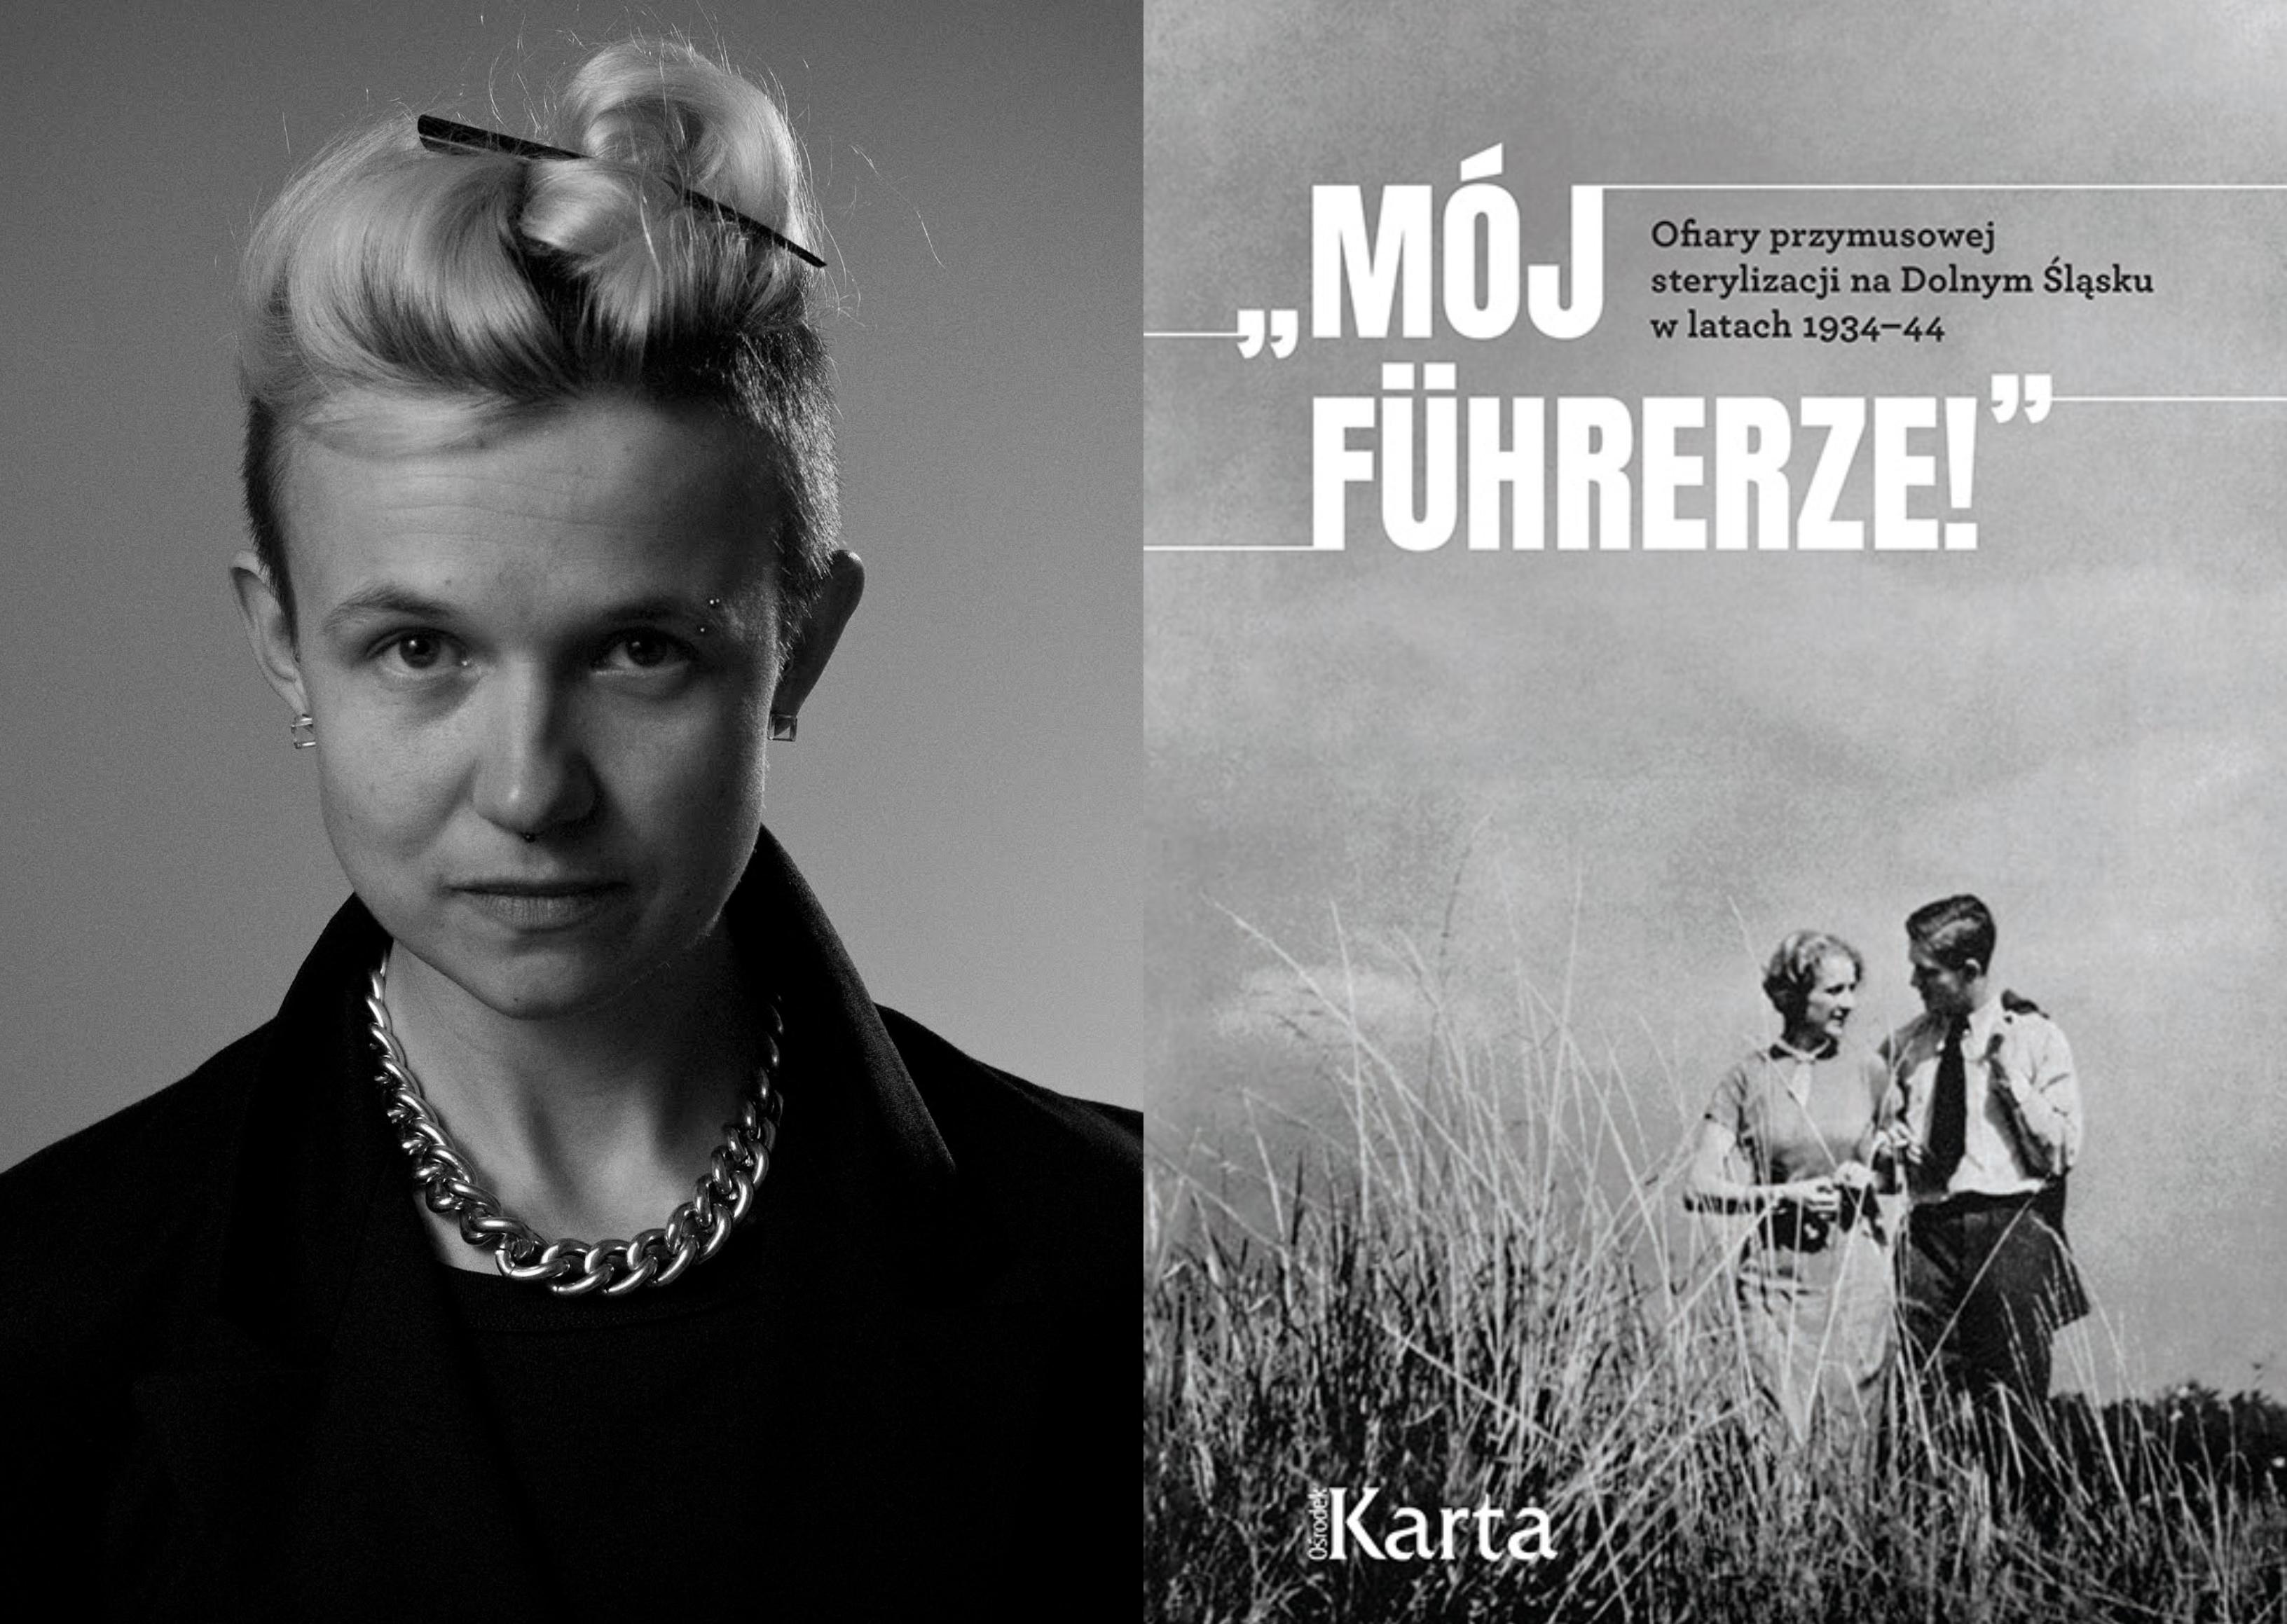 Joanna Ostrowska, autorka książki 'Mój Führerze' (fot. Witold Orski)